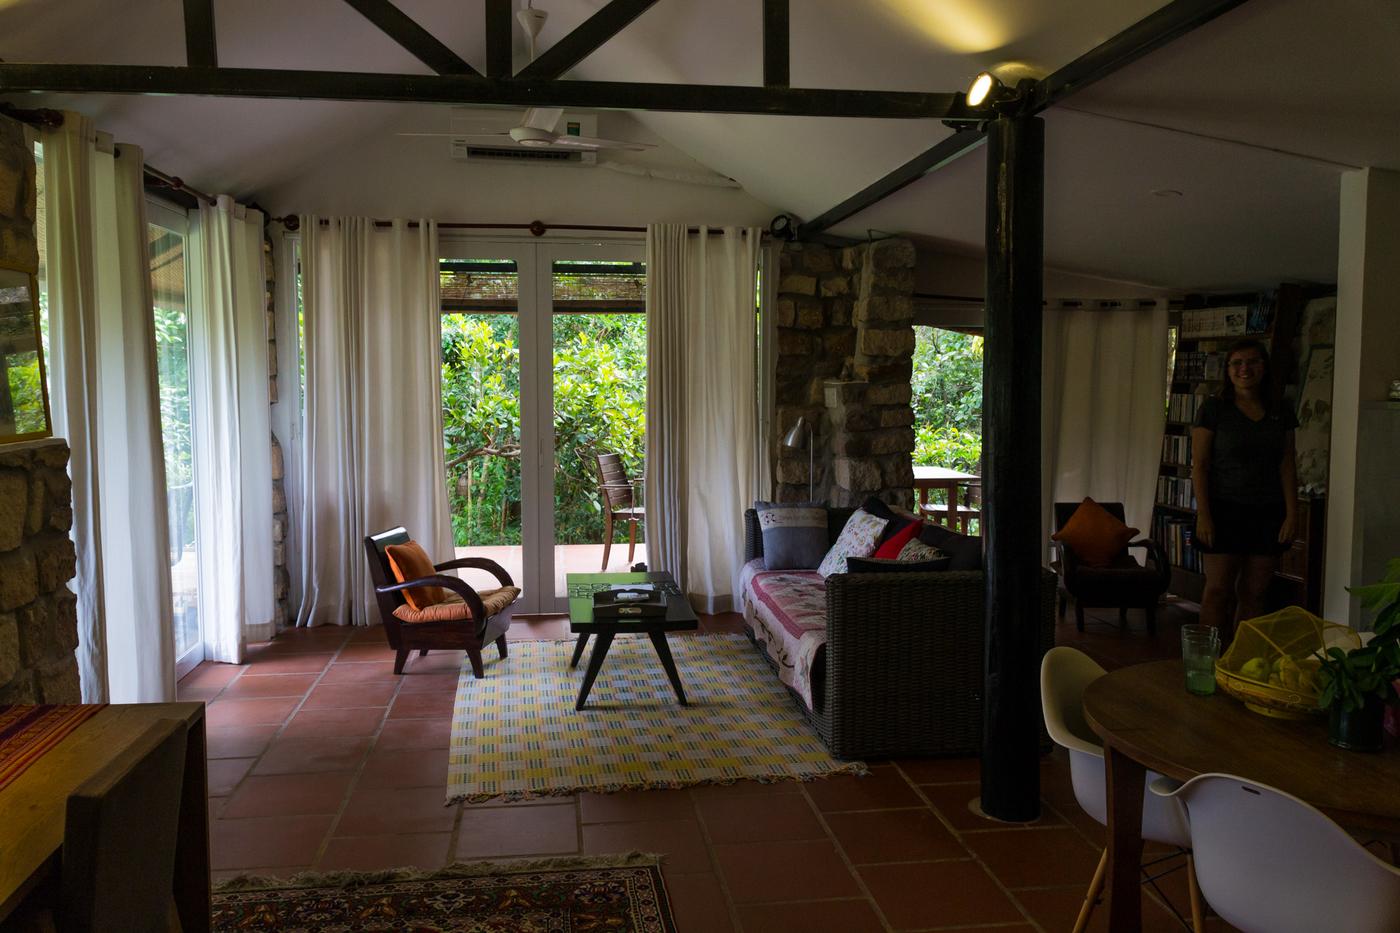 Phu-Quoc-airbnb.jpg